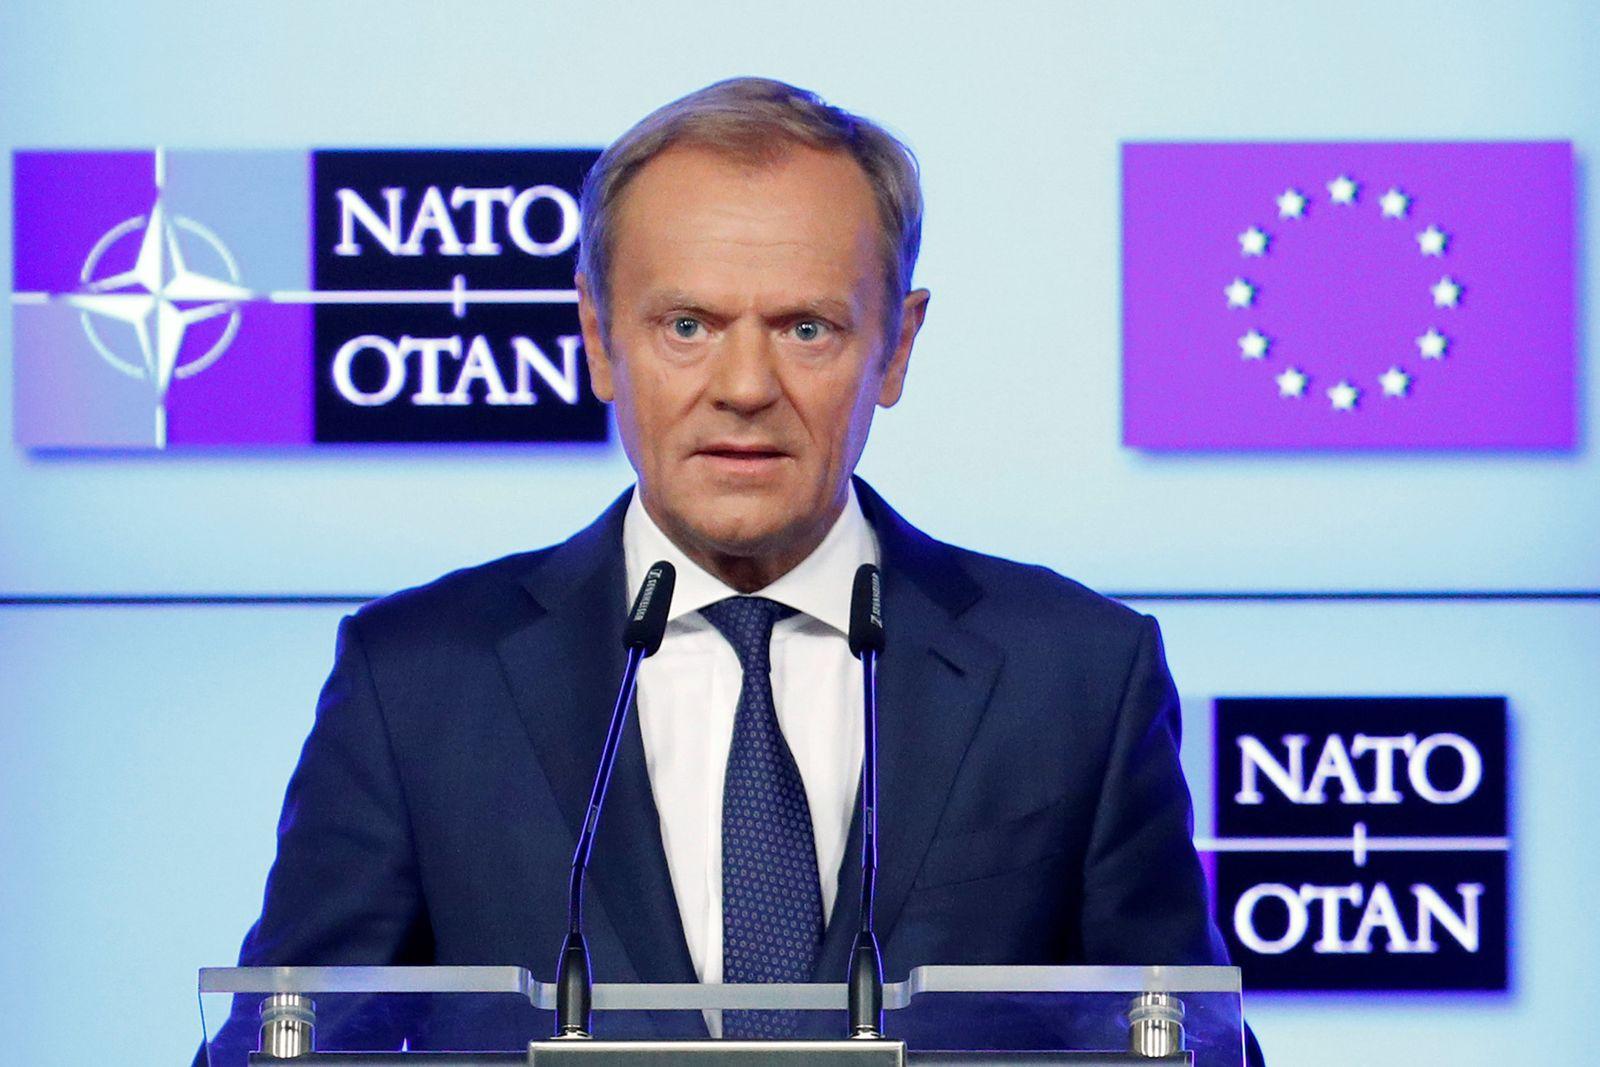 NATO-SUMMIT/EU